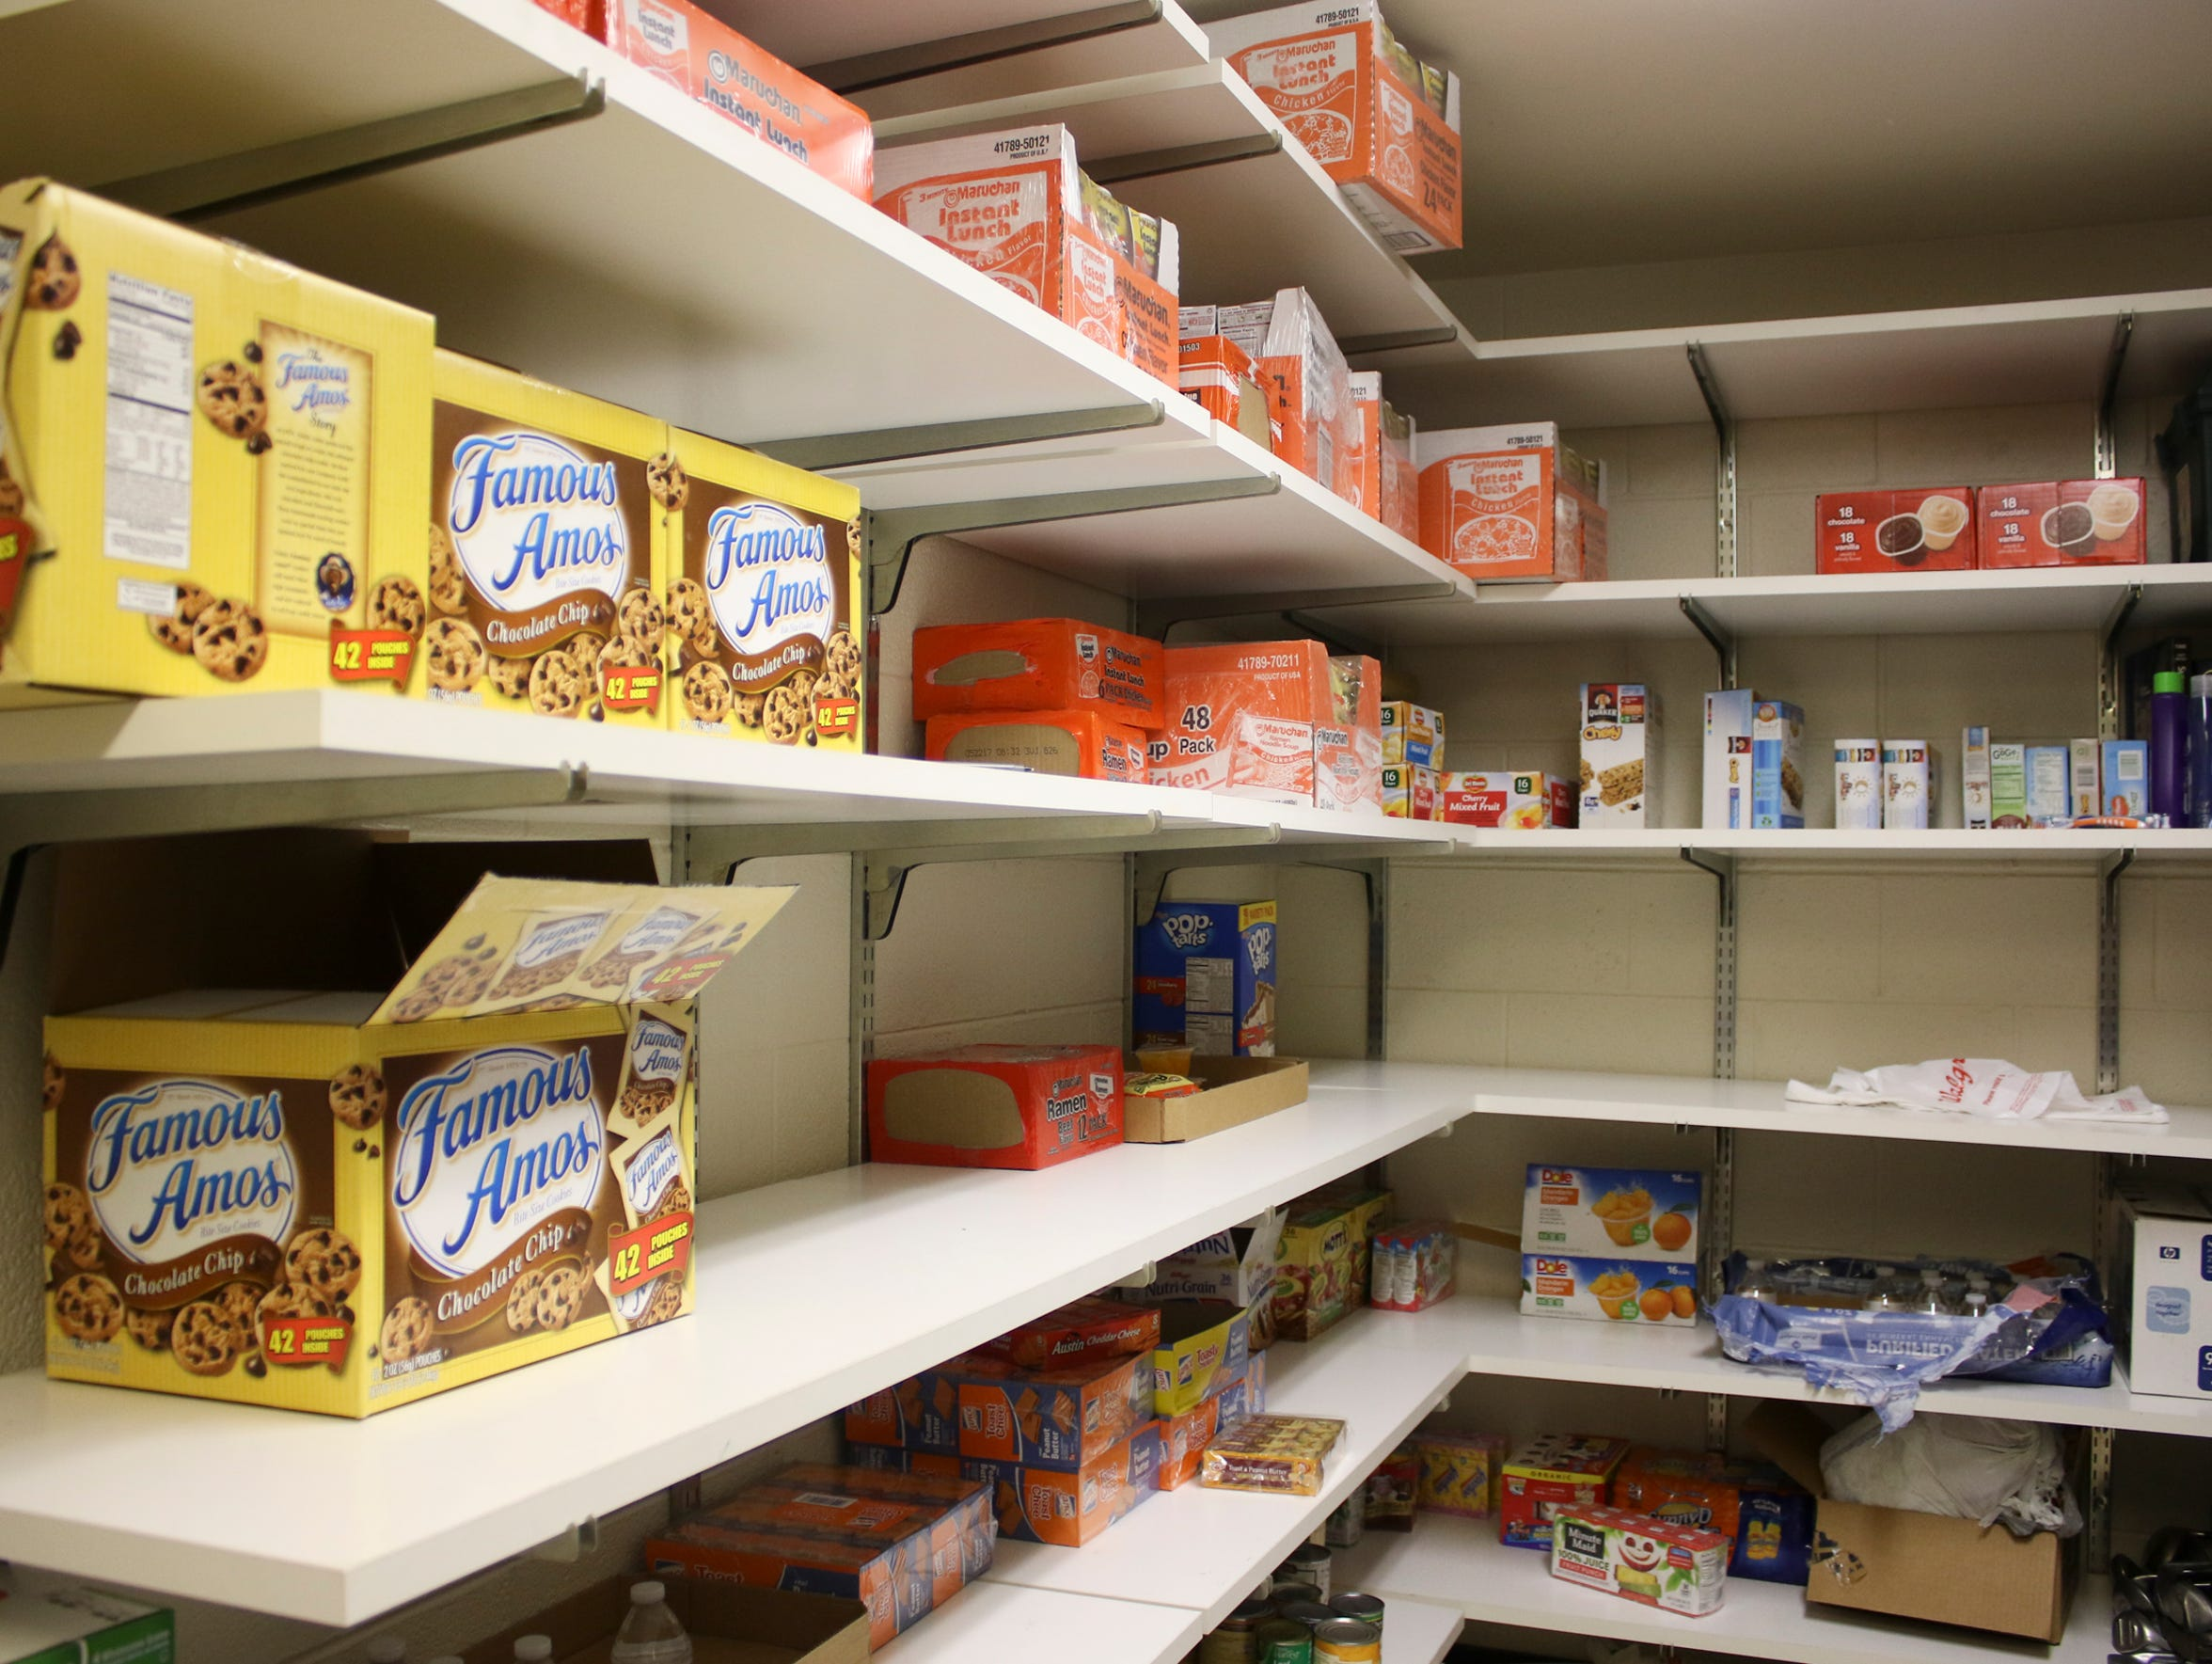 Teens4Teens donations help stock the FUEL room at school